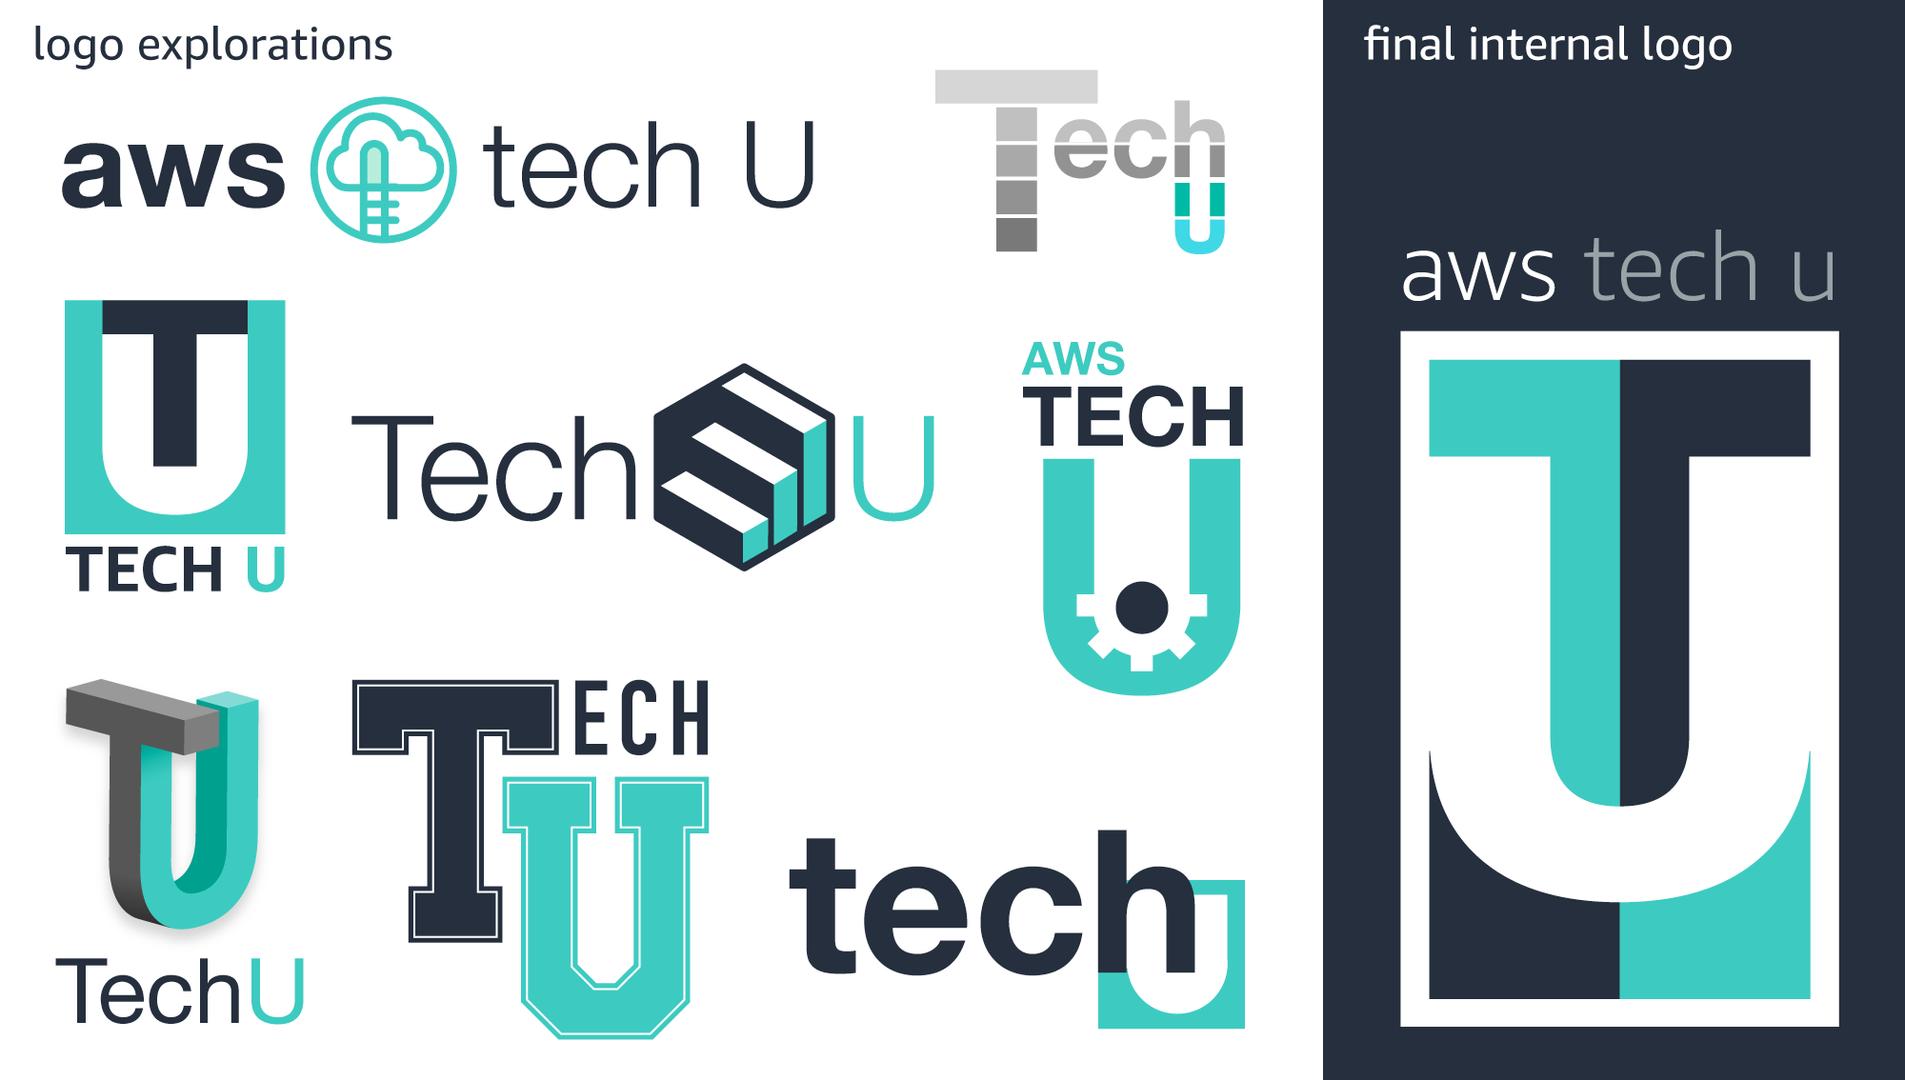 Logo explorations for the internal Tech U program